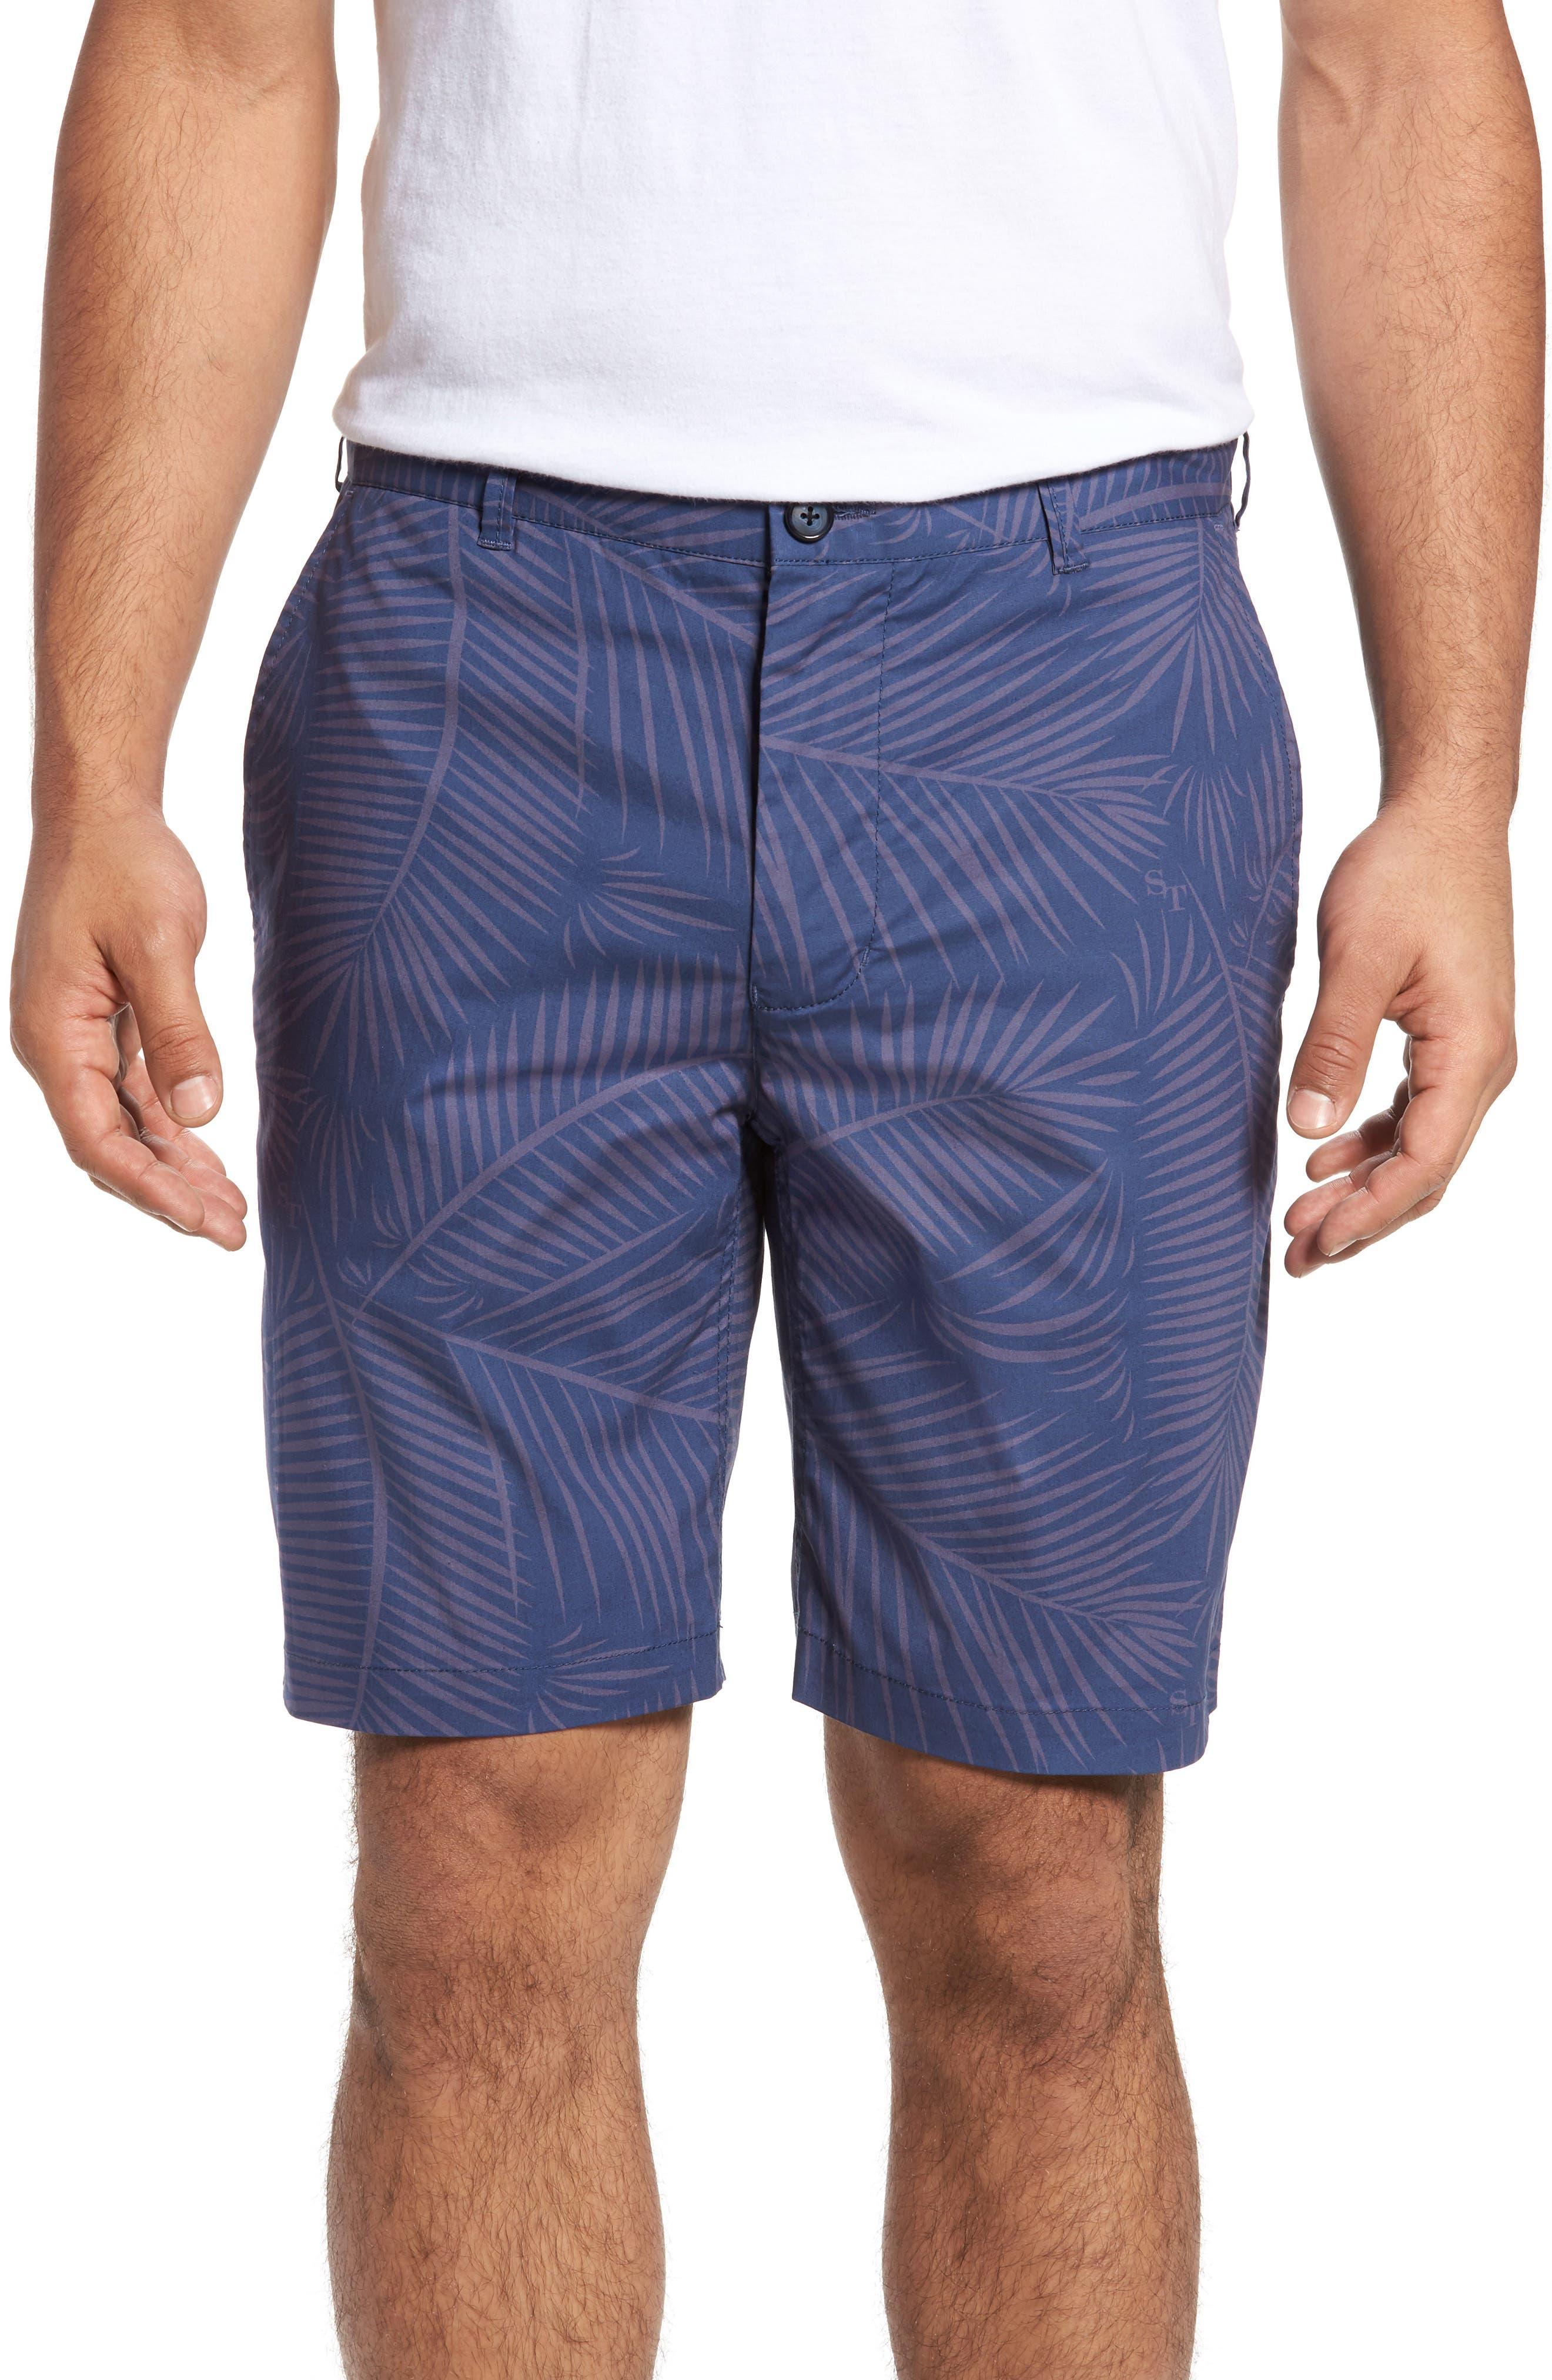 Alternate Image 1 Selected - Southern Tide Pelican Peak Shorts